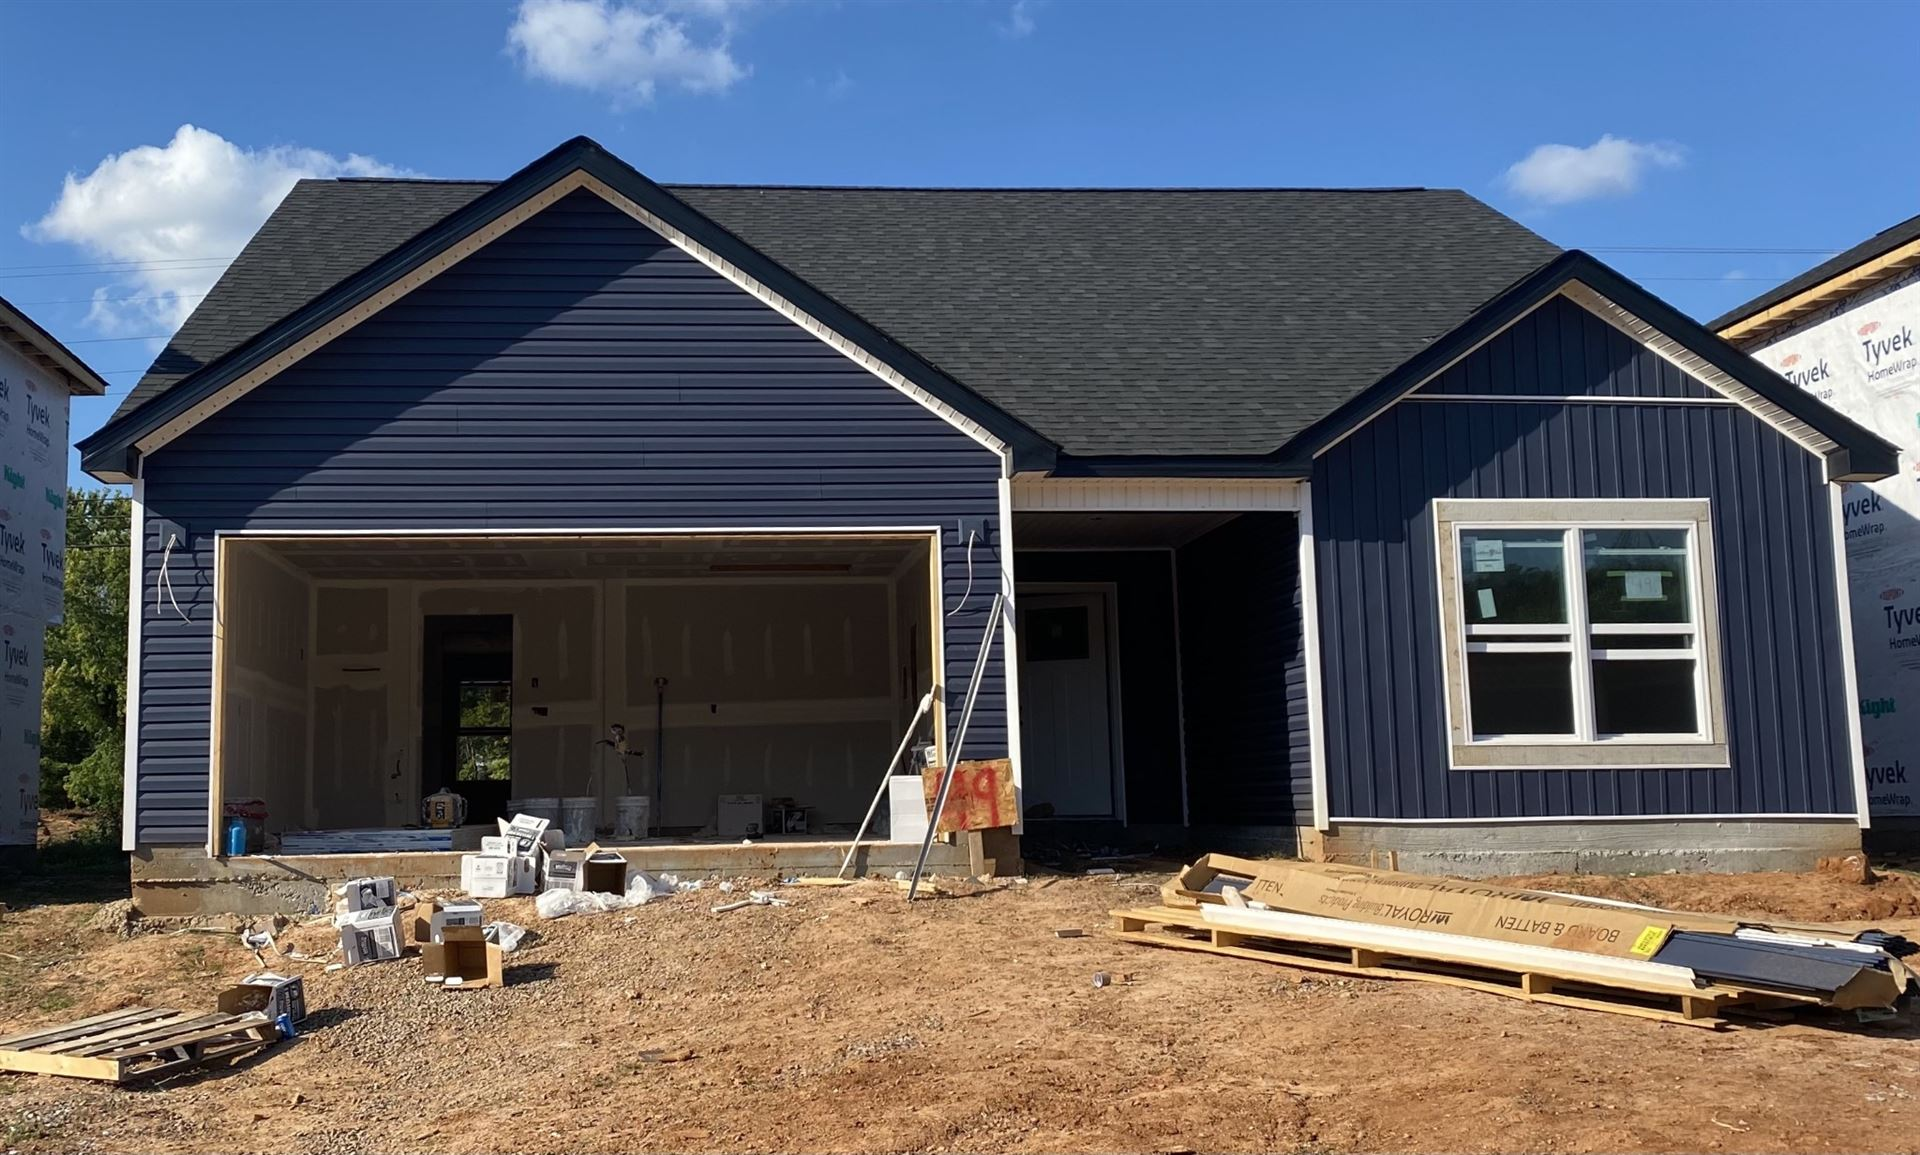 49 Campbell Heights, Clarksville, TN 37042 - MLS#: 2292064